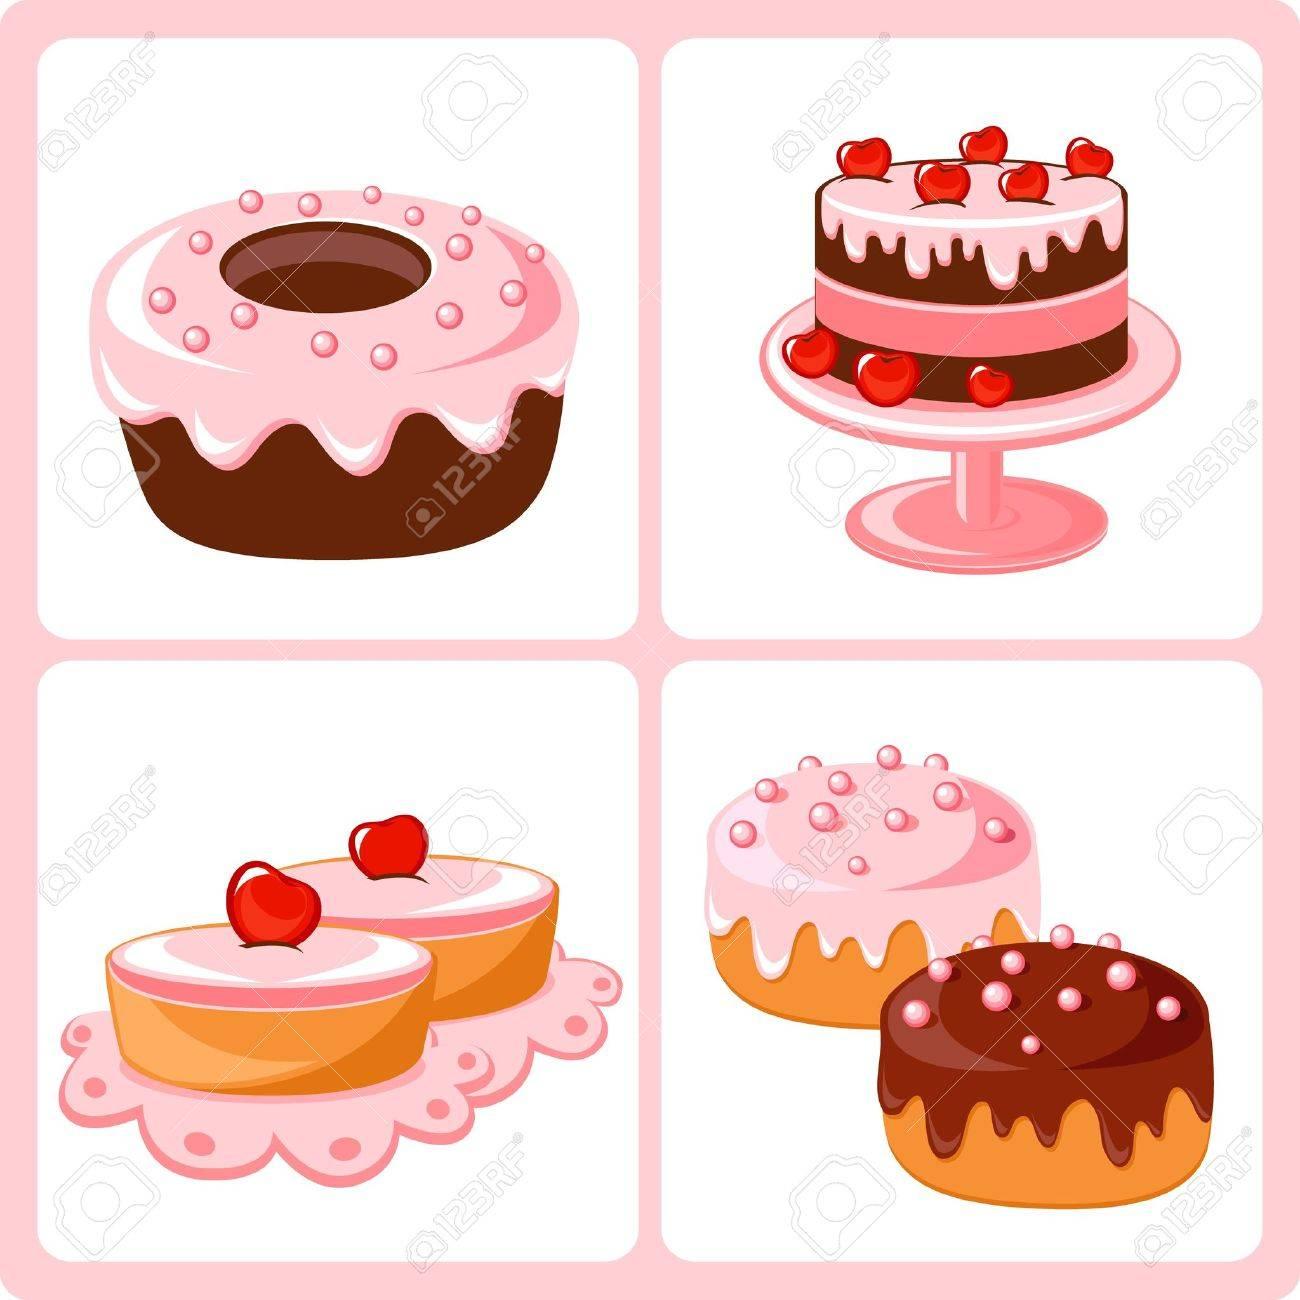 sweet pastry Stock Vector - 12326747